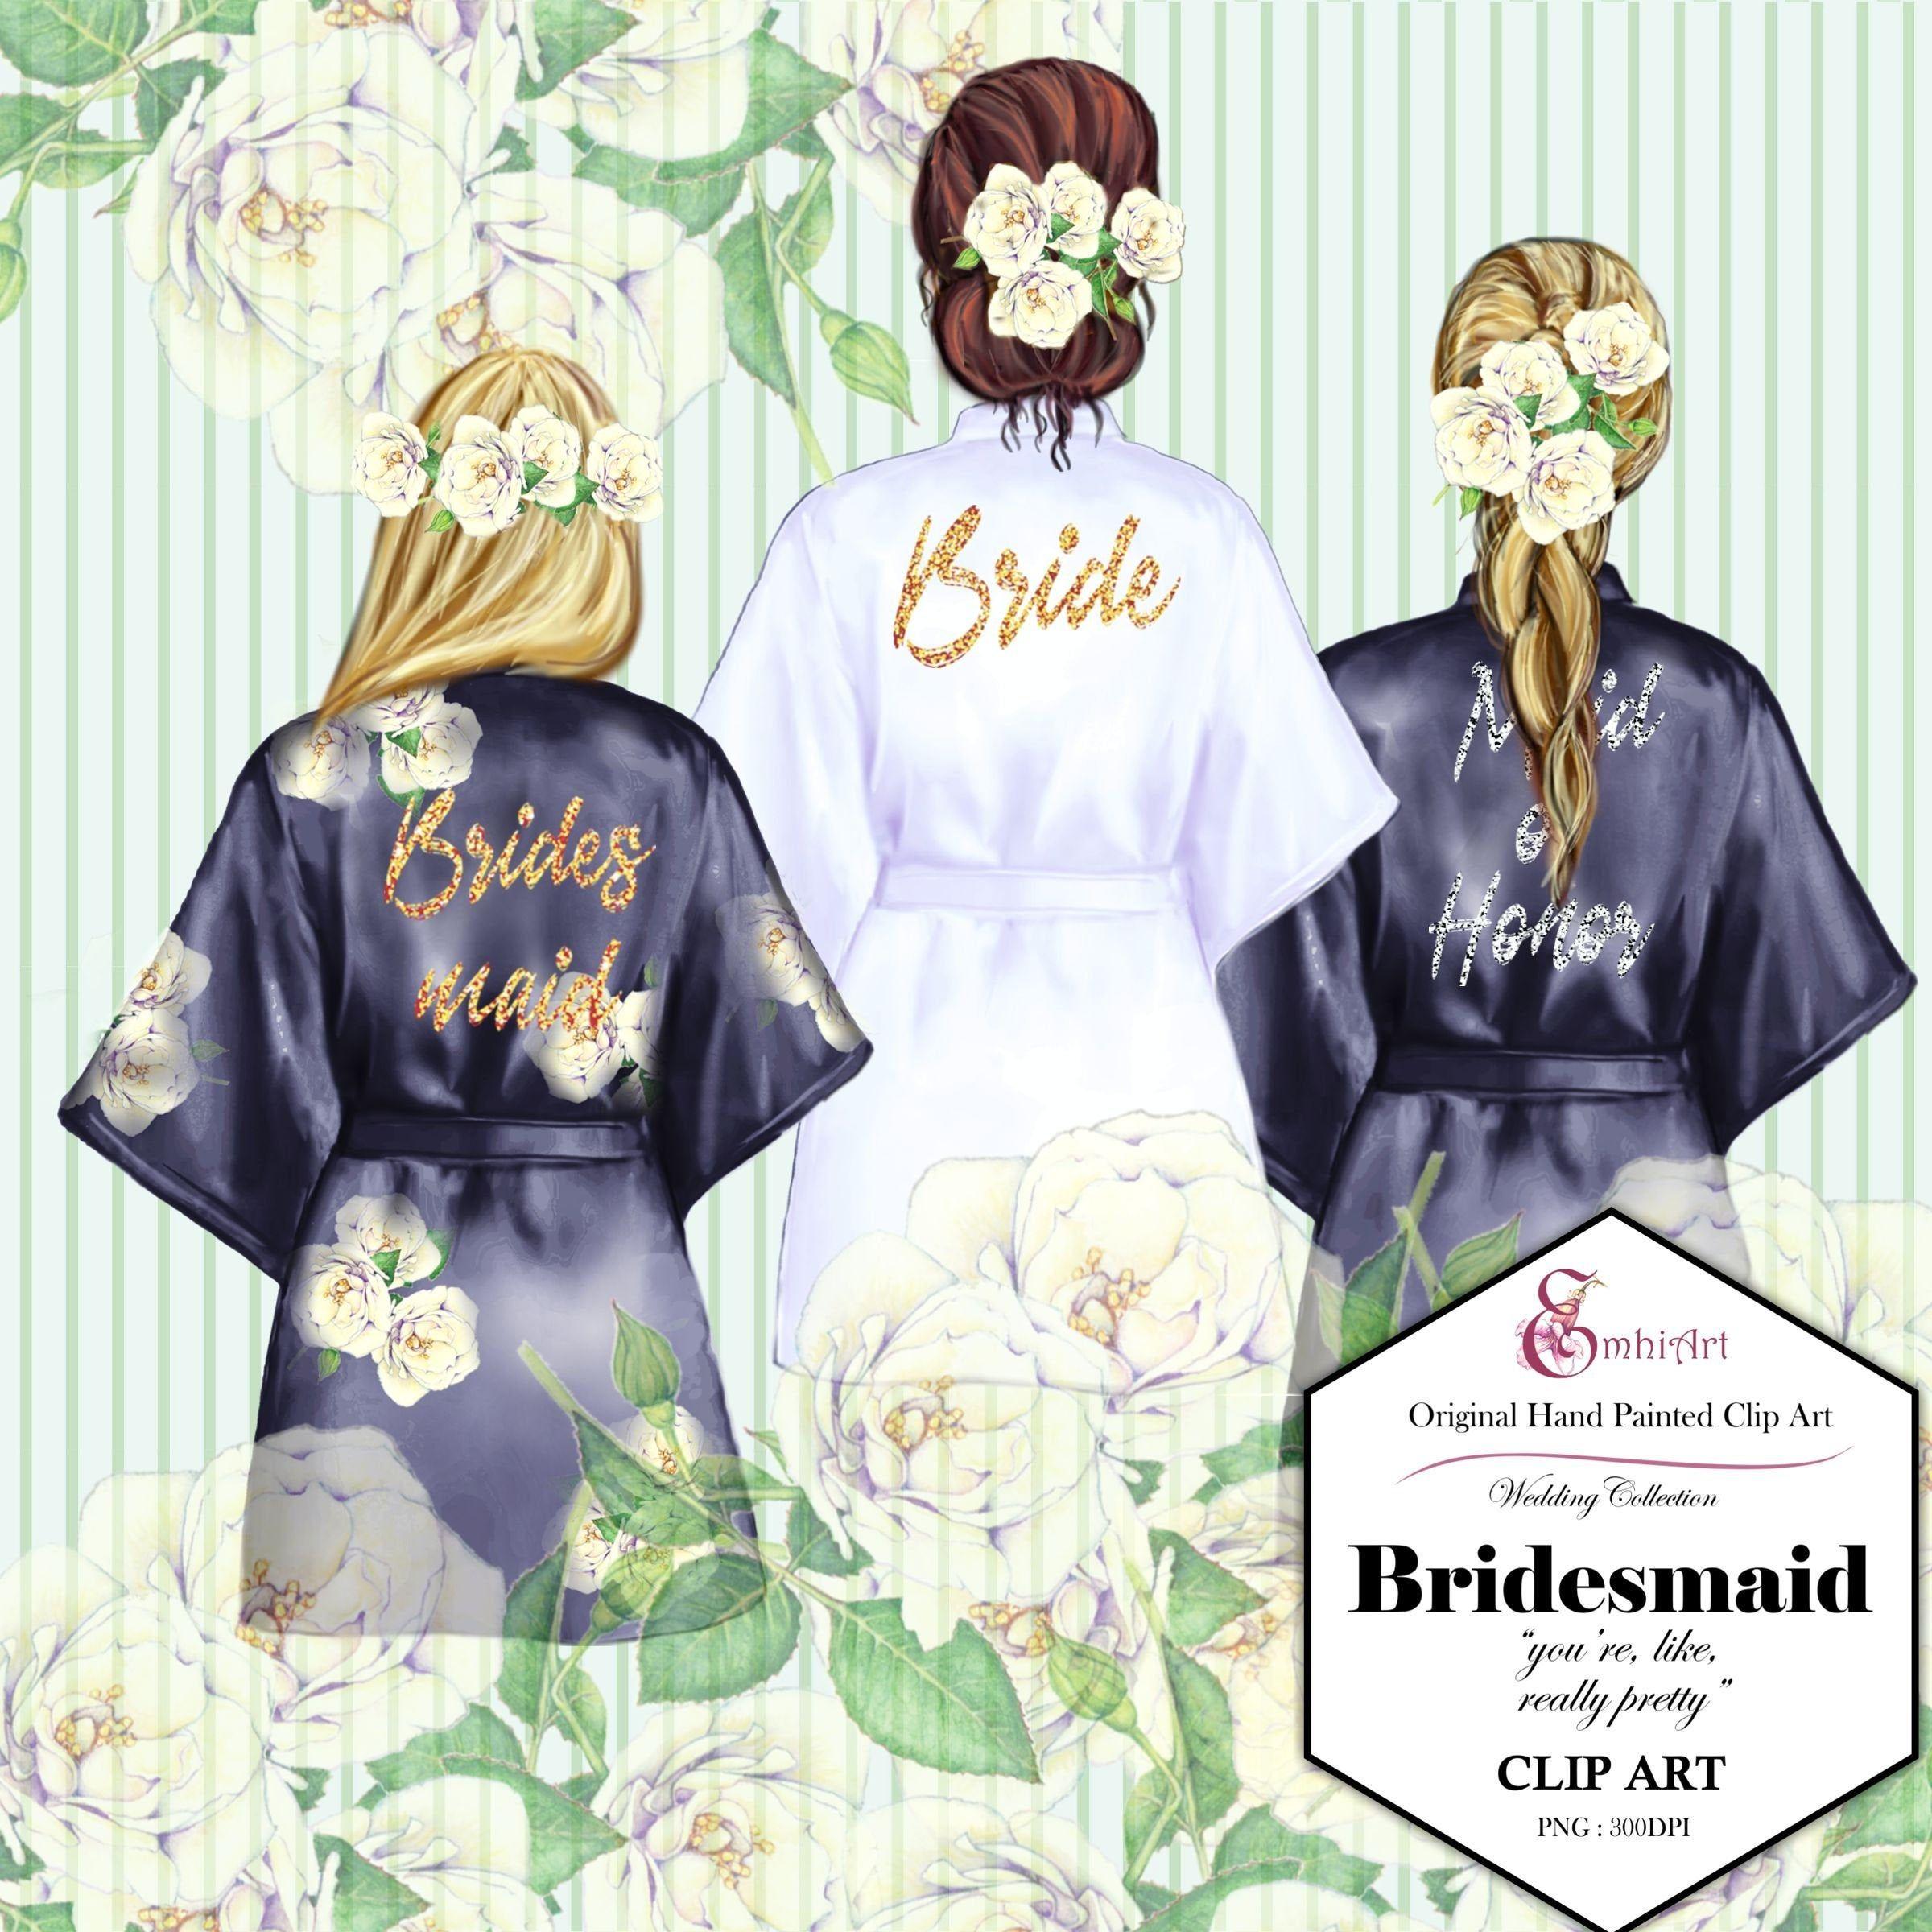 Bridesmaid Robe Clipart Bride Clipart Bridal Shower Maid Of Honor